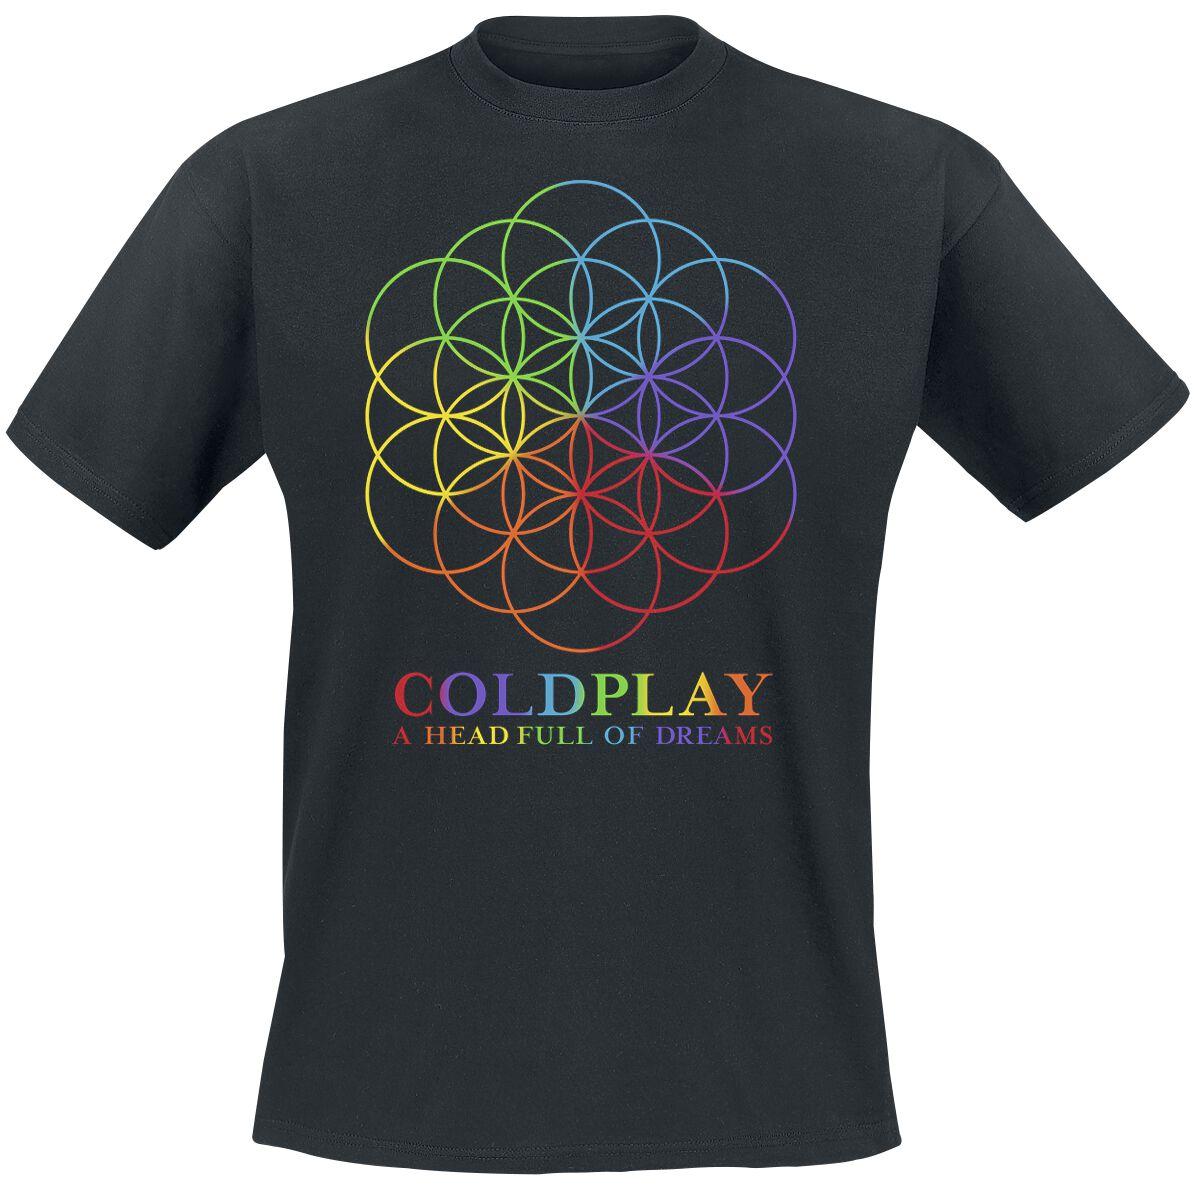 Zespoły - Koszulki - T-Shirt Coldplay A Head Full Of Dreams T-Shirt czarny - 364483